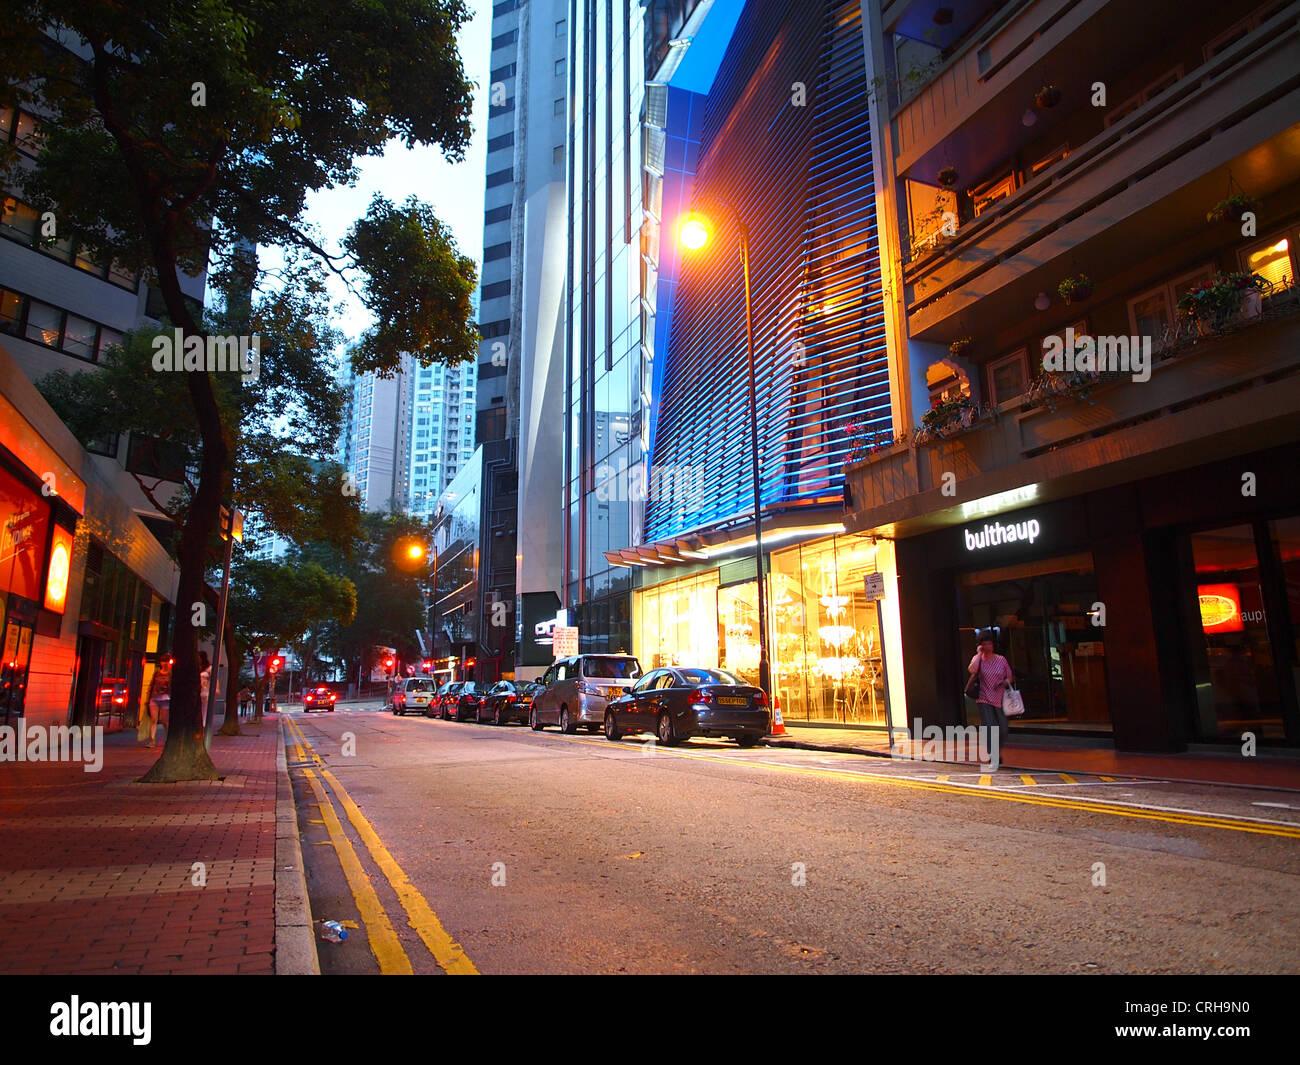 causeway bay hong kong night stock photos causeway bay hong kong night stock images alamy. Black Bedroom Furniture Sets. Home Design Ideas